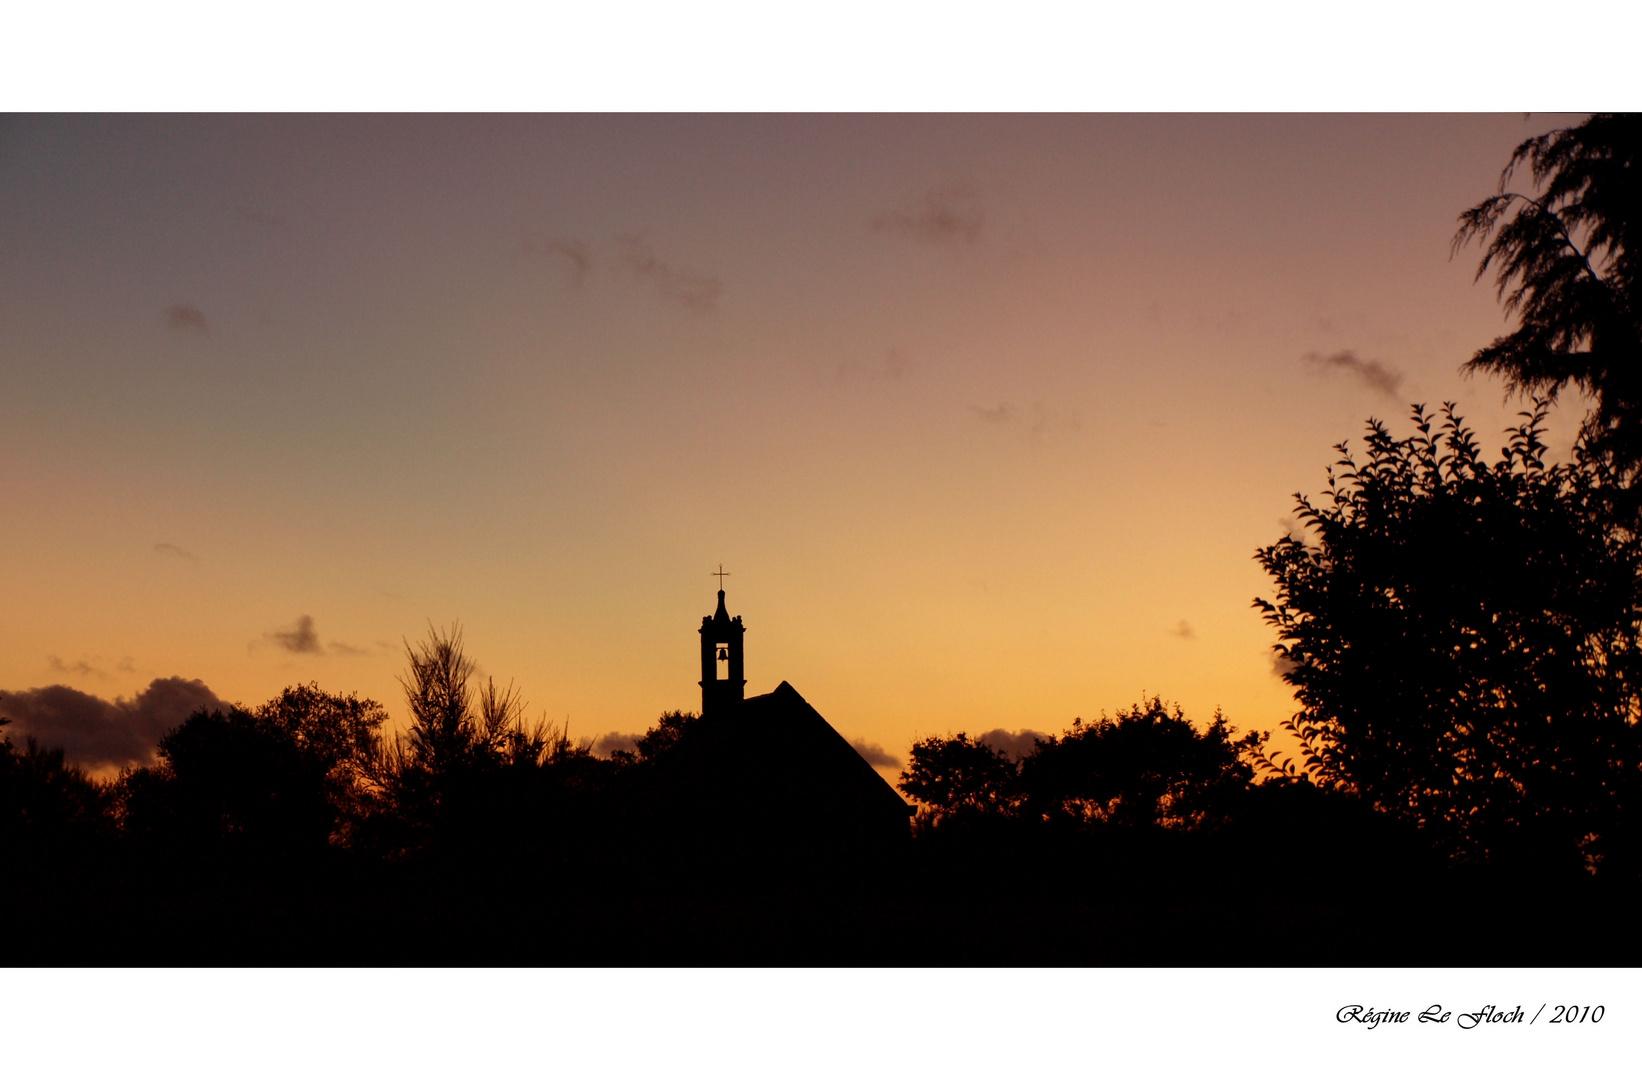 Sonnenuntergang auf La Motte, bei Locronan